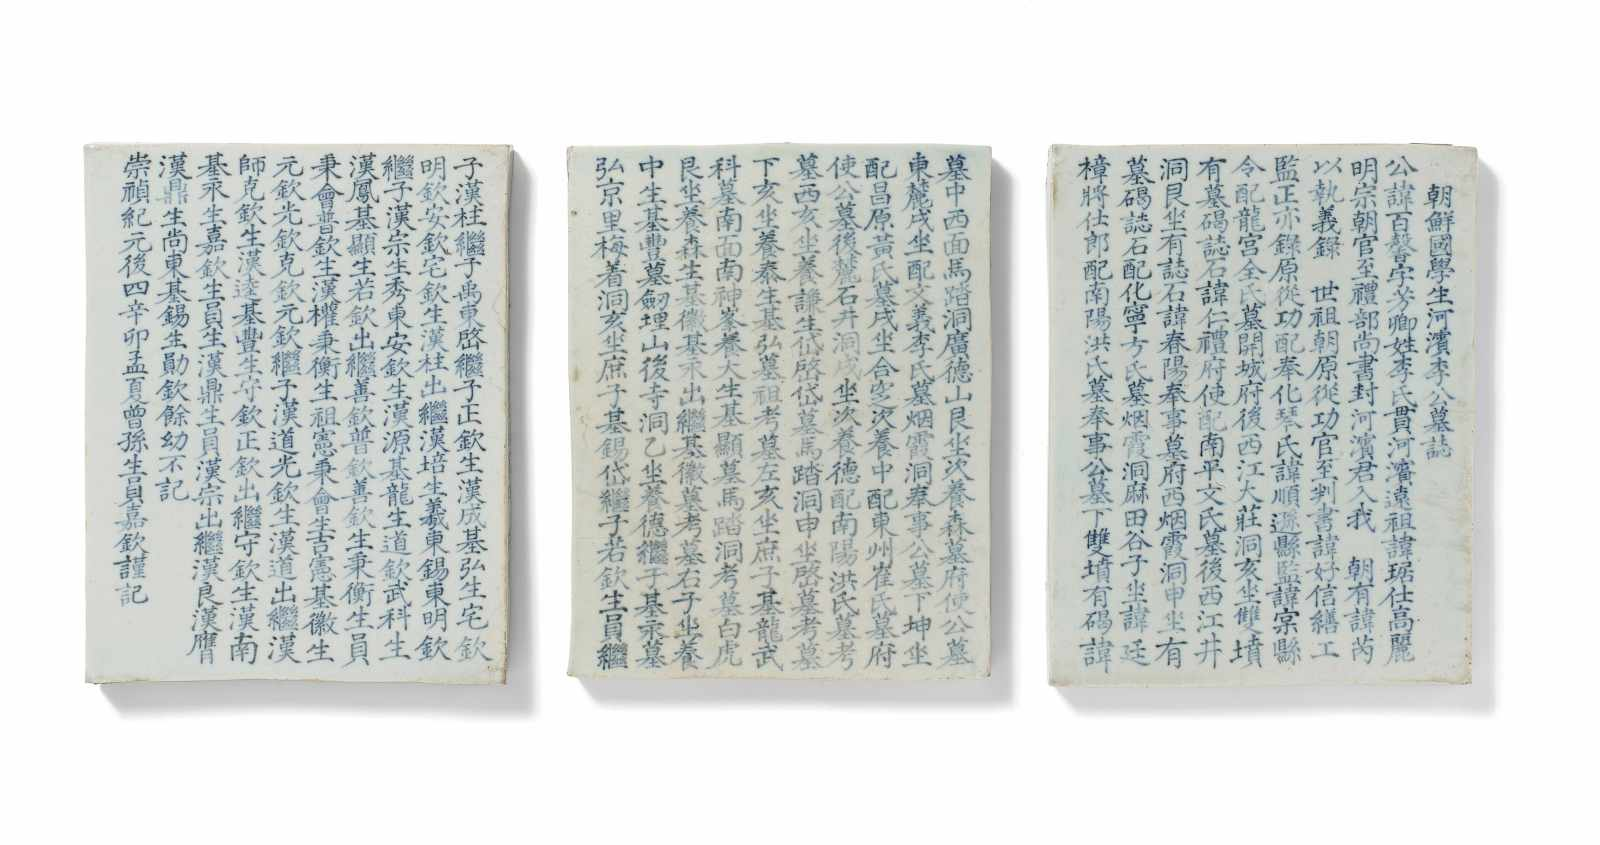 Lot 2029 - DREI EPITAPH-TAFELN FÜR LEE BAEK-HYONG. Korea. Gwangju Öfen, Kyonggi Provinz. Joseon-Dynastie (